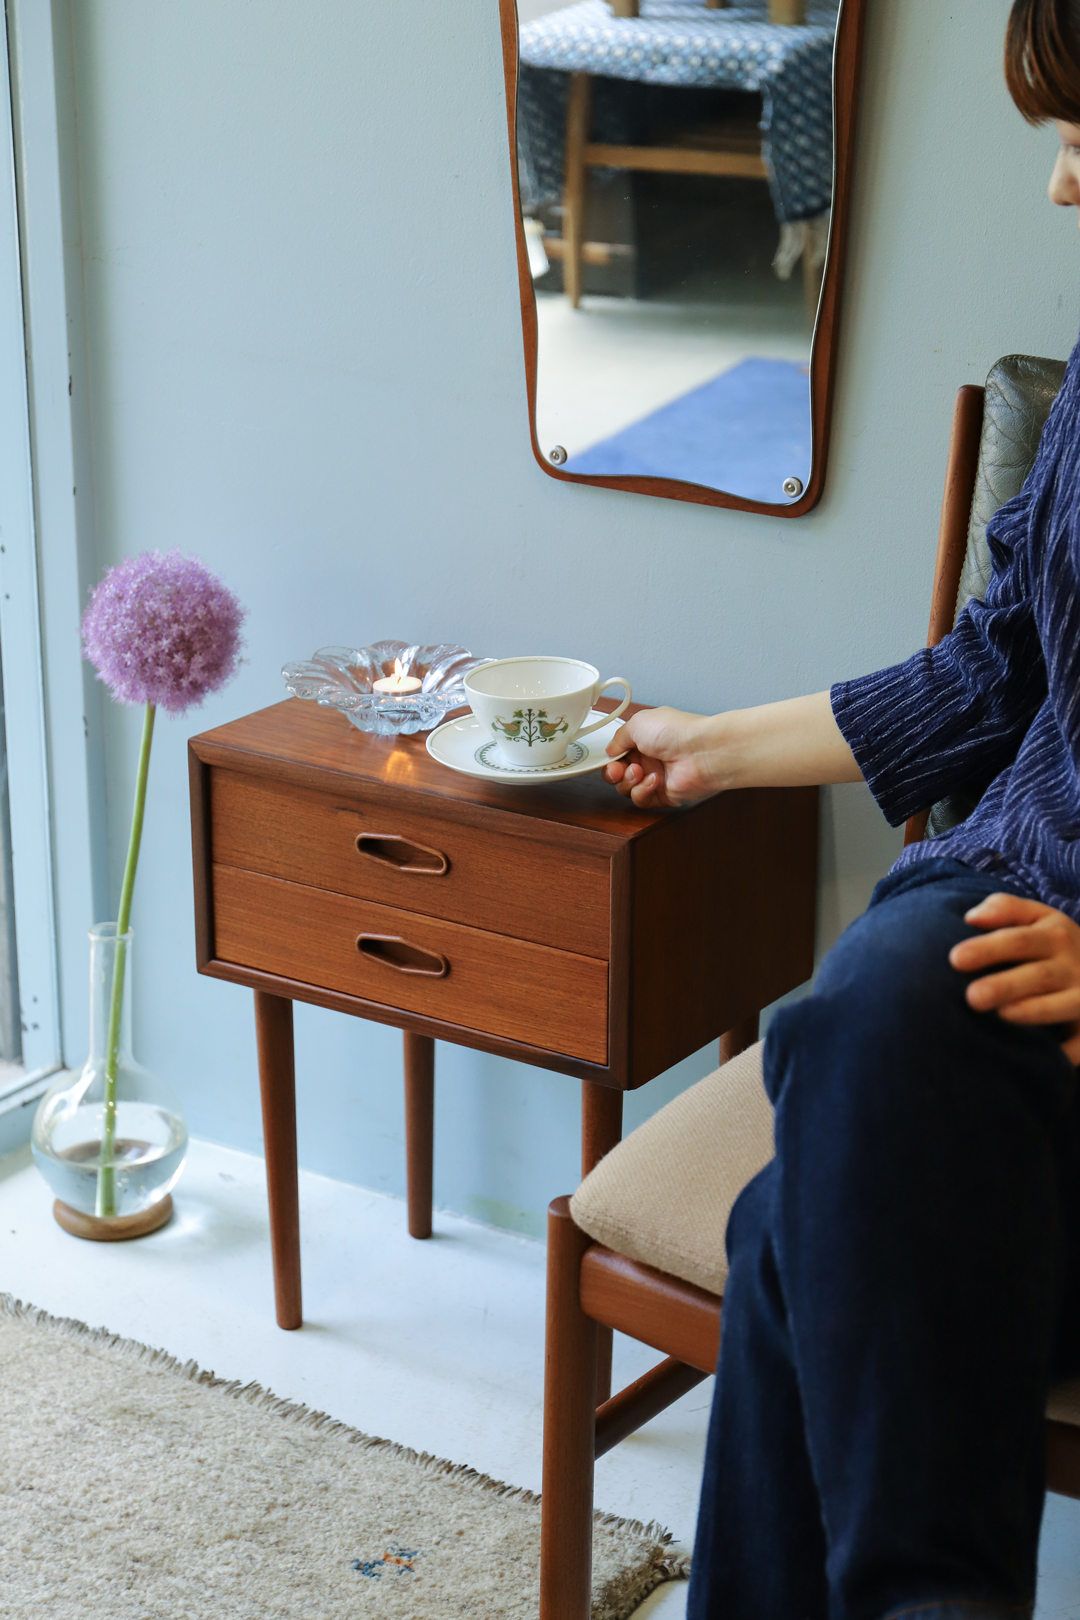 Danish Vintage Bedside Chest/デンマーク ヴィンテージ ベッドサイドチェスト サイドテーブル チーク材 北欧家具